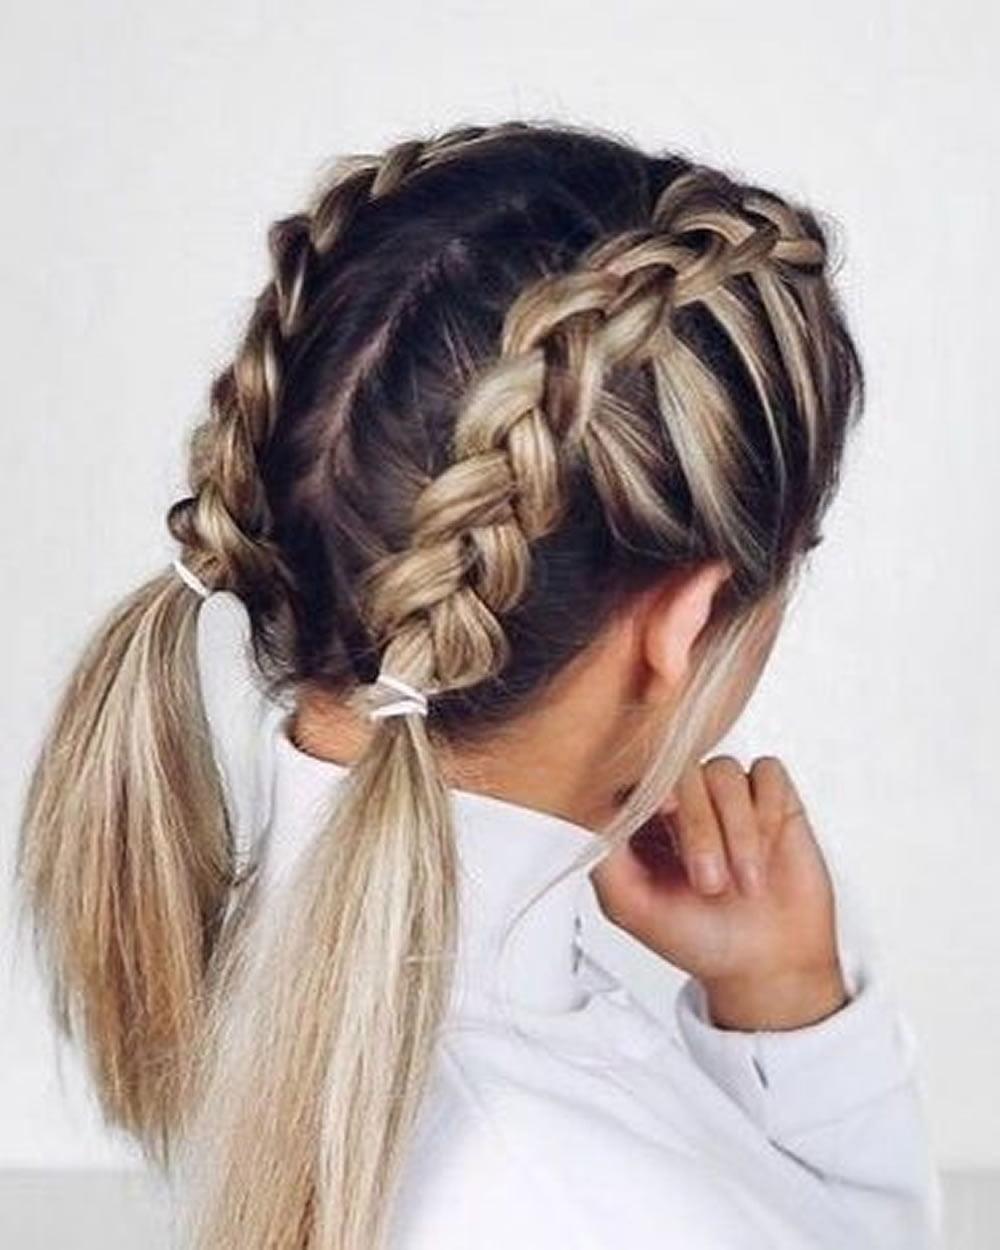 French Braids 2018 (Mermaid, Half-up, Side, Fishtail etc.) - Trend French Braid Hair Ideas ...